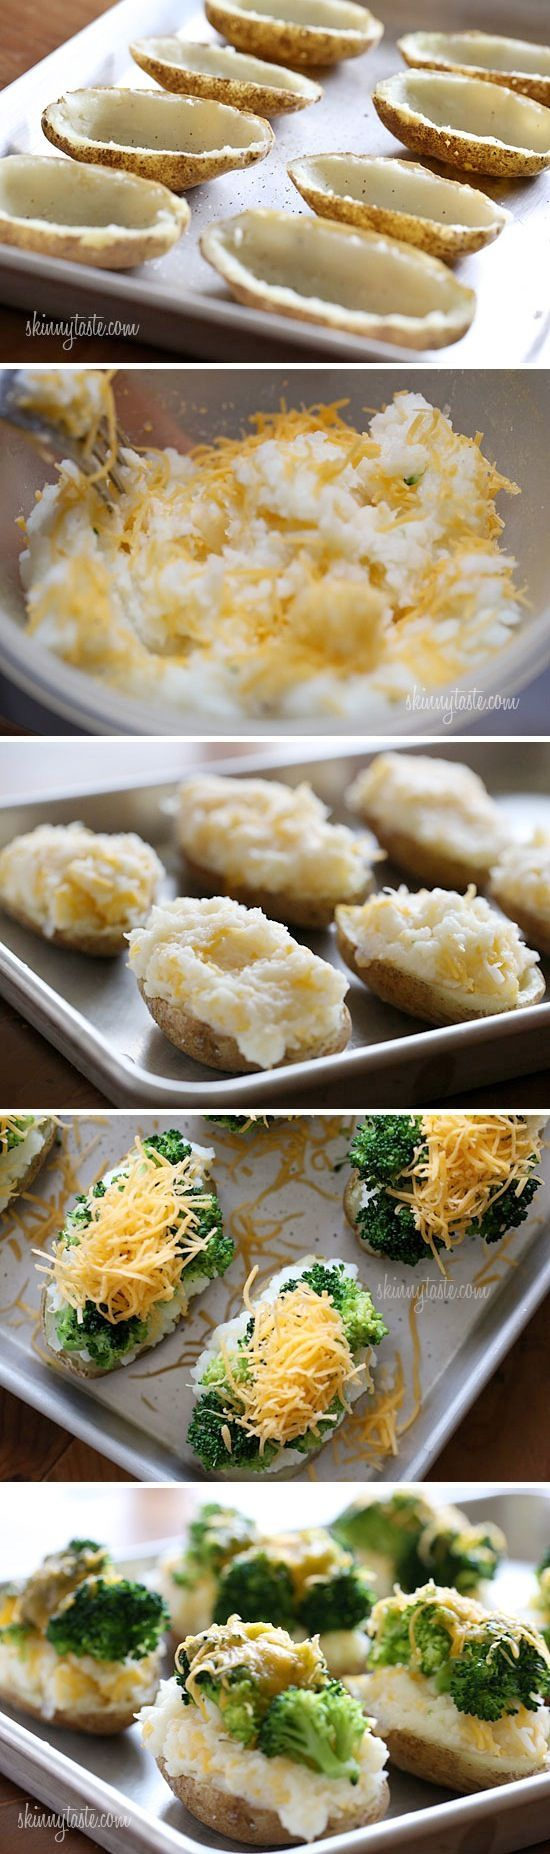 Broccoli and Cheese Twice Baked Potatoes. A mi se me a ocurrido poner en lugar de brocoli espinacas!!! :)